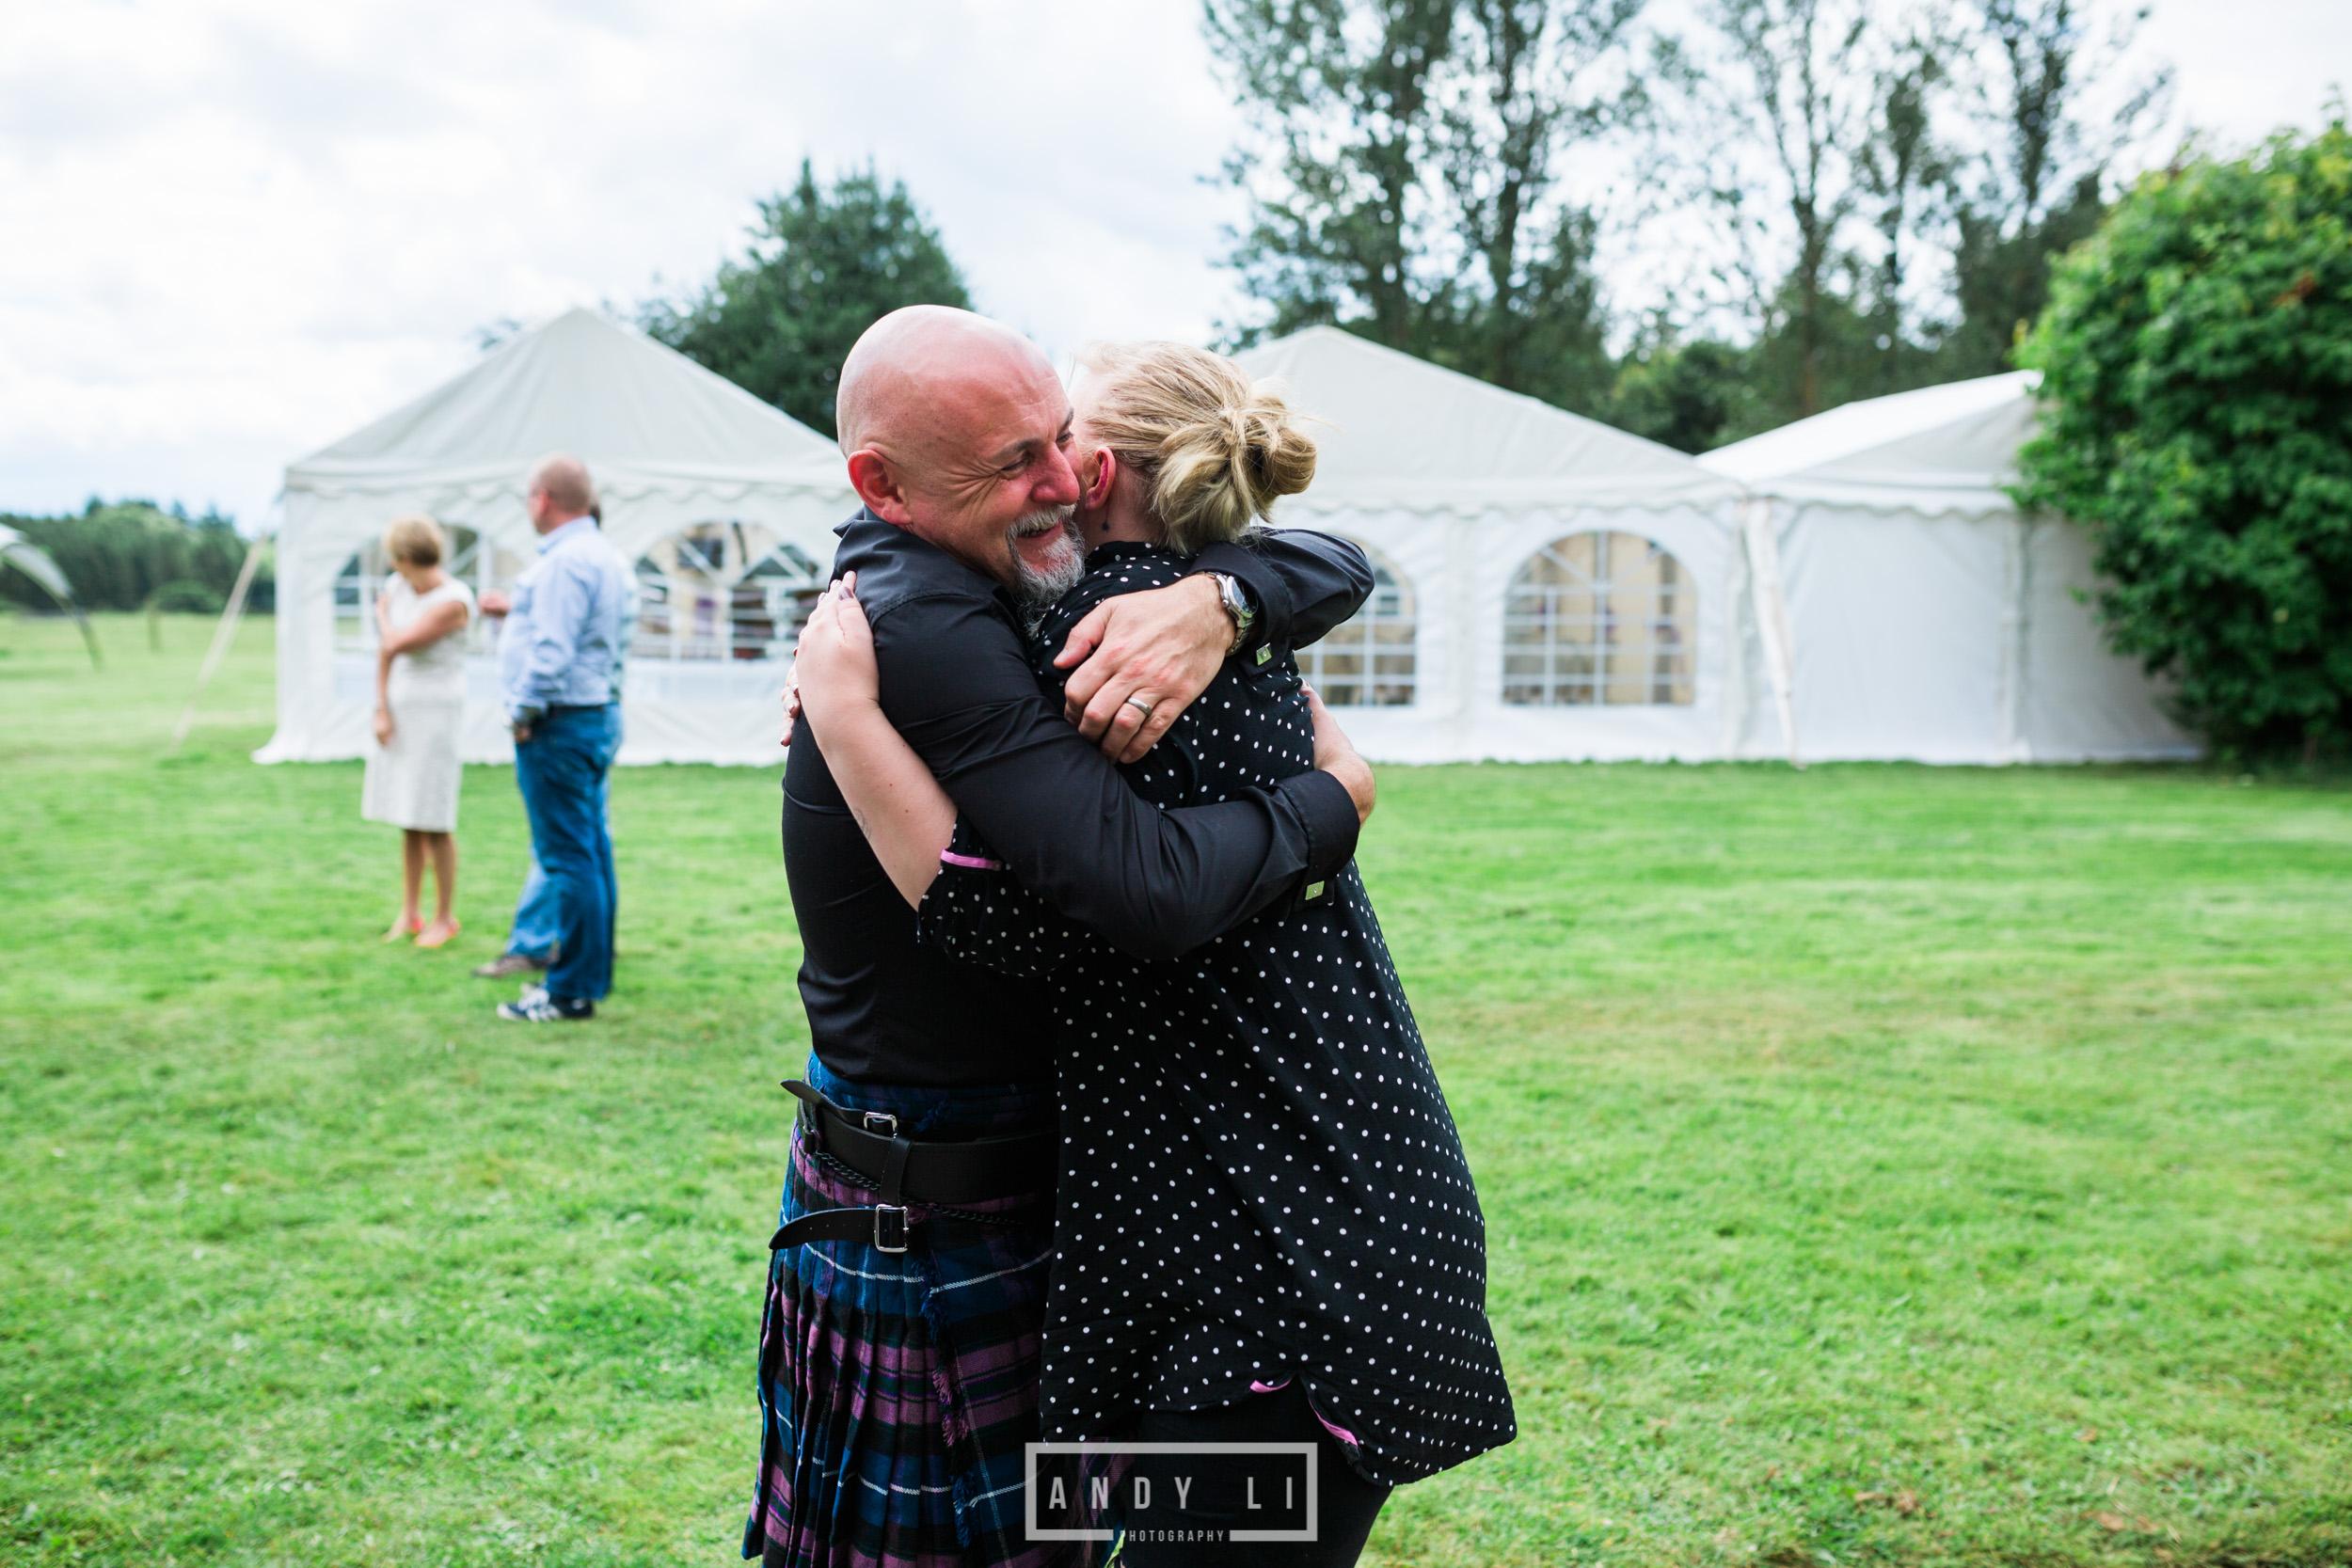 Festival Wedding Shropshire-Andy Li Photography-043.jpg